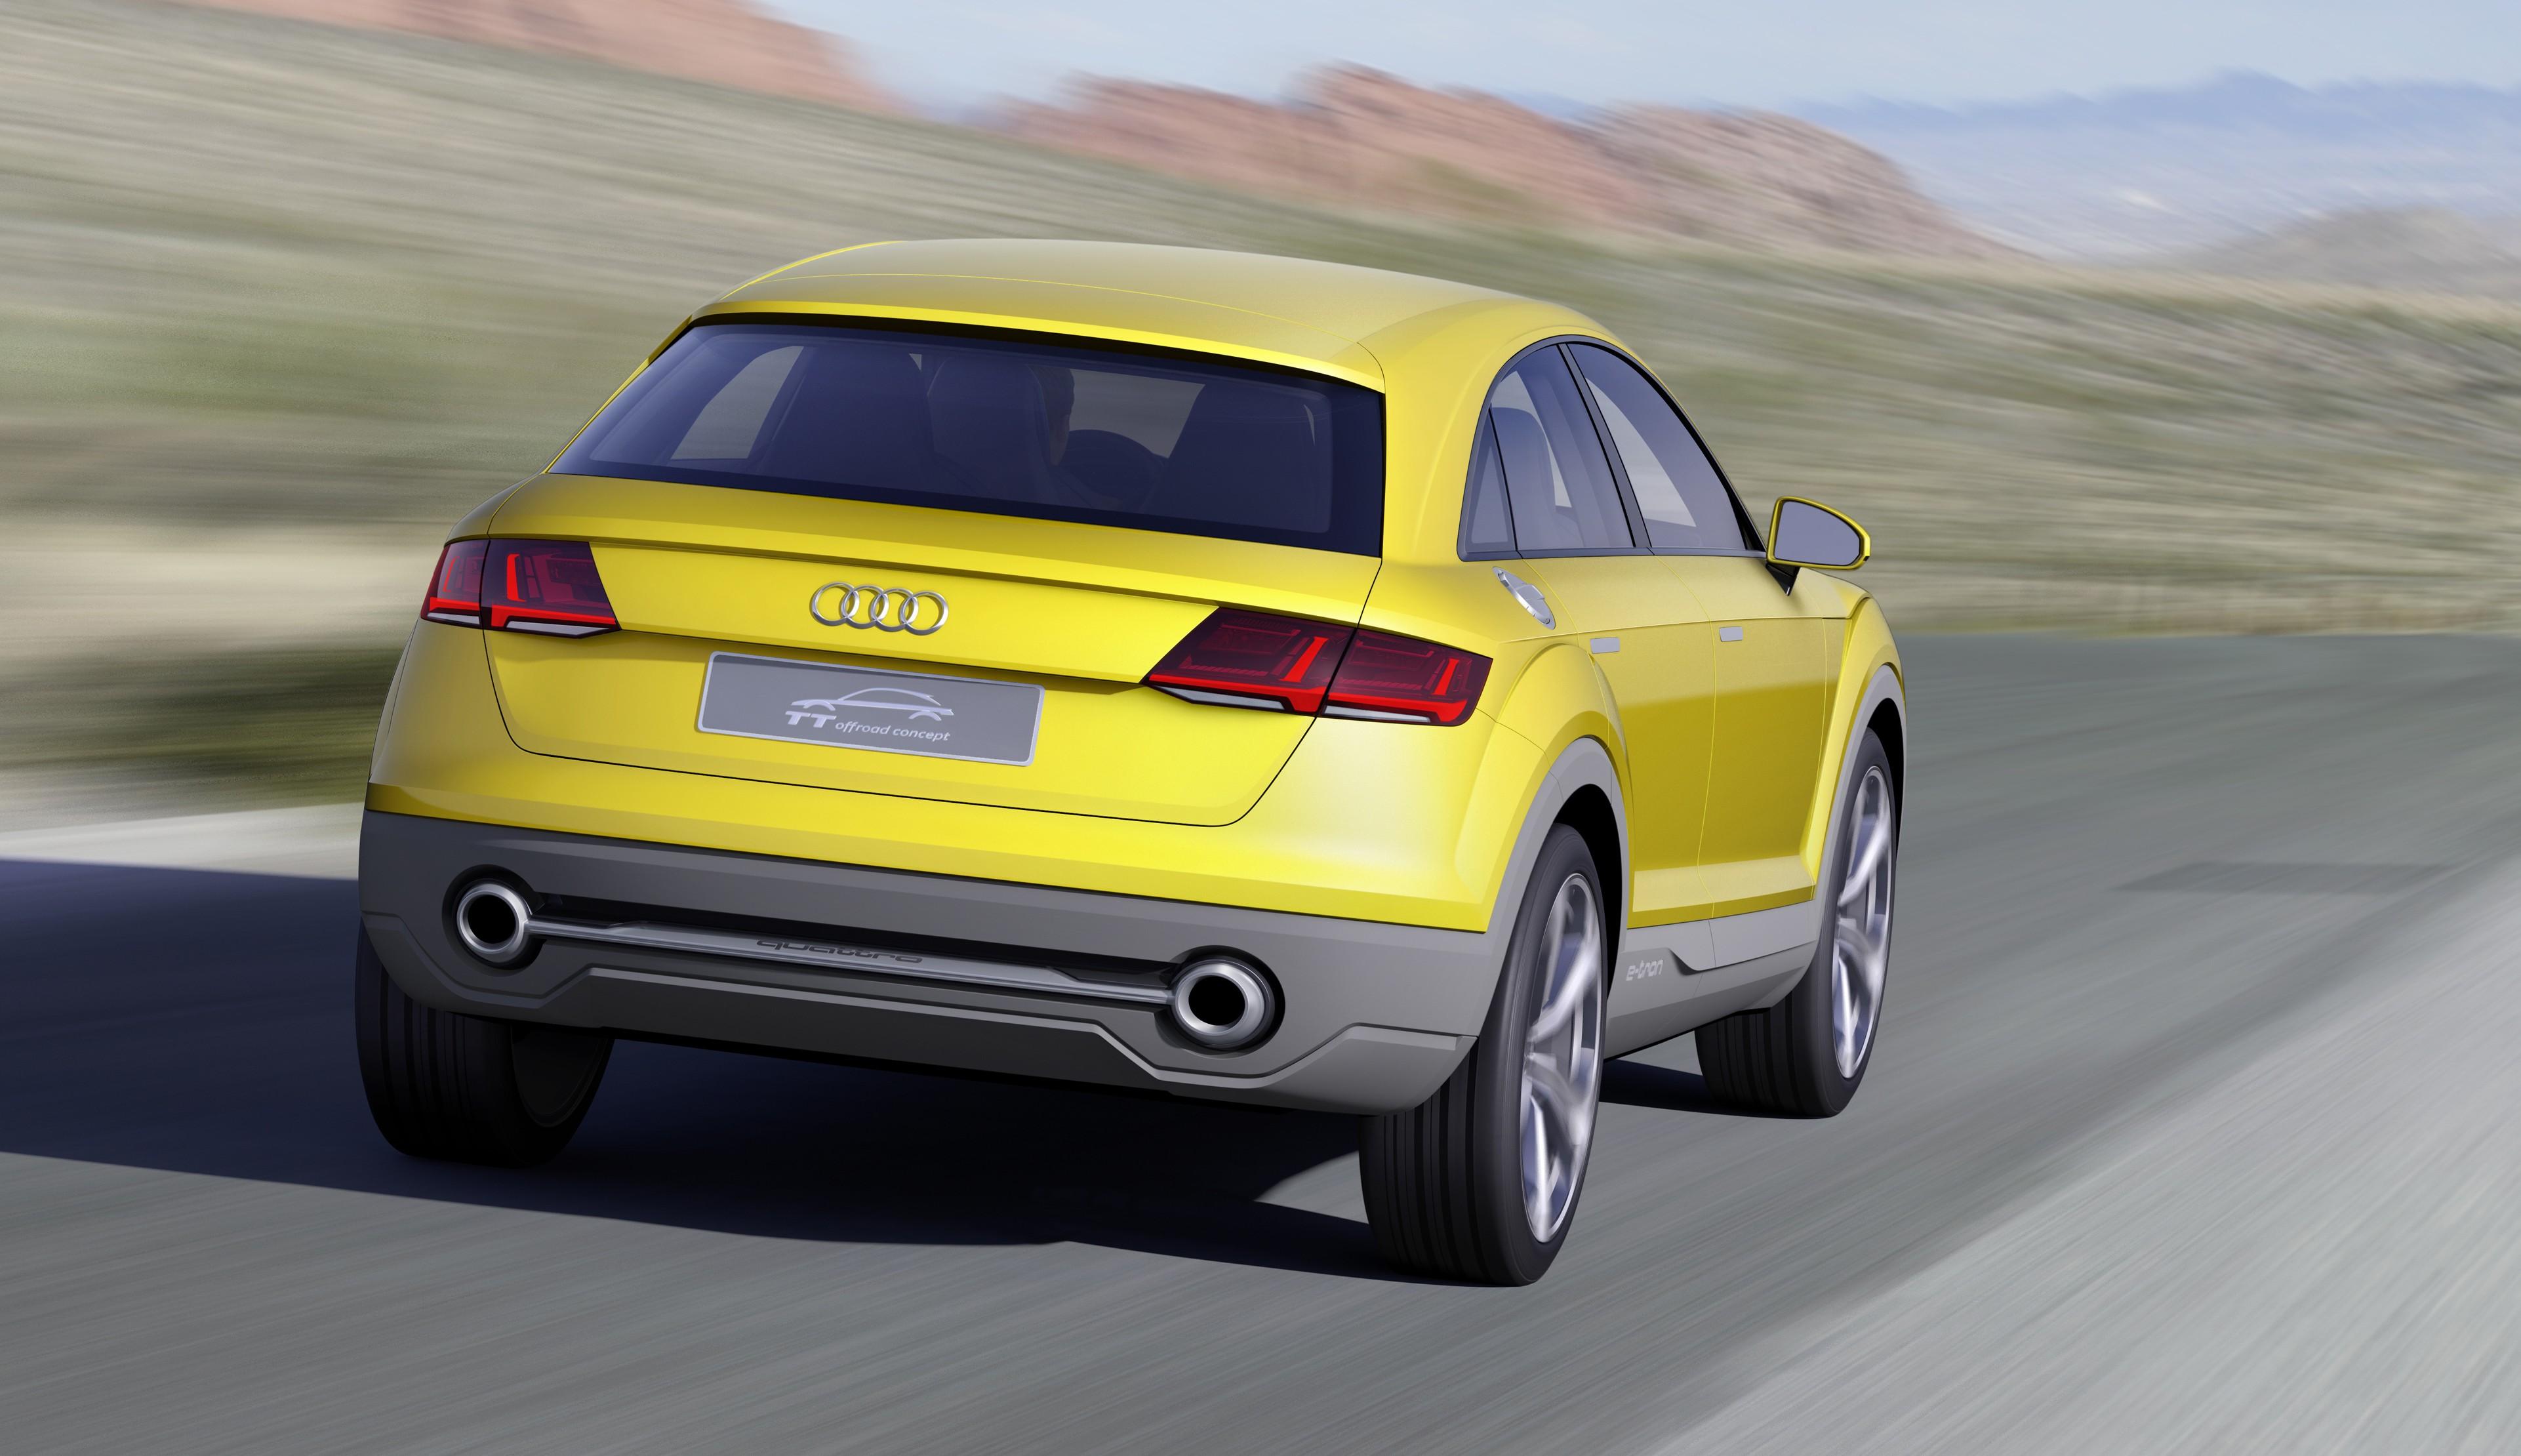 Audi TT Offroad Concept previews future Q4 'TT SUV' Image 242656